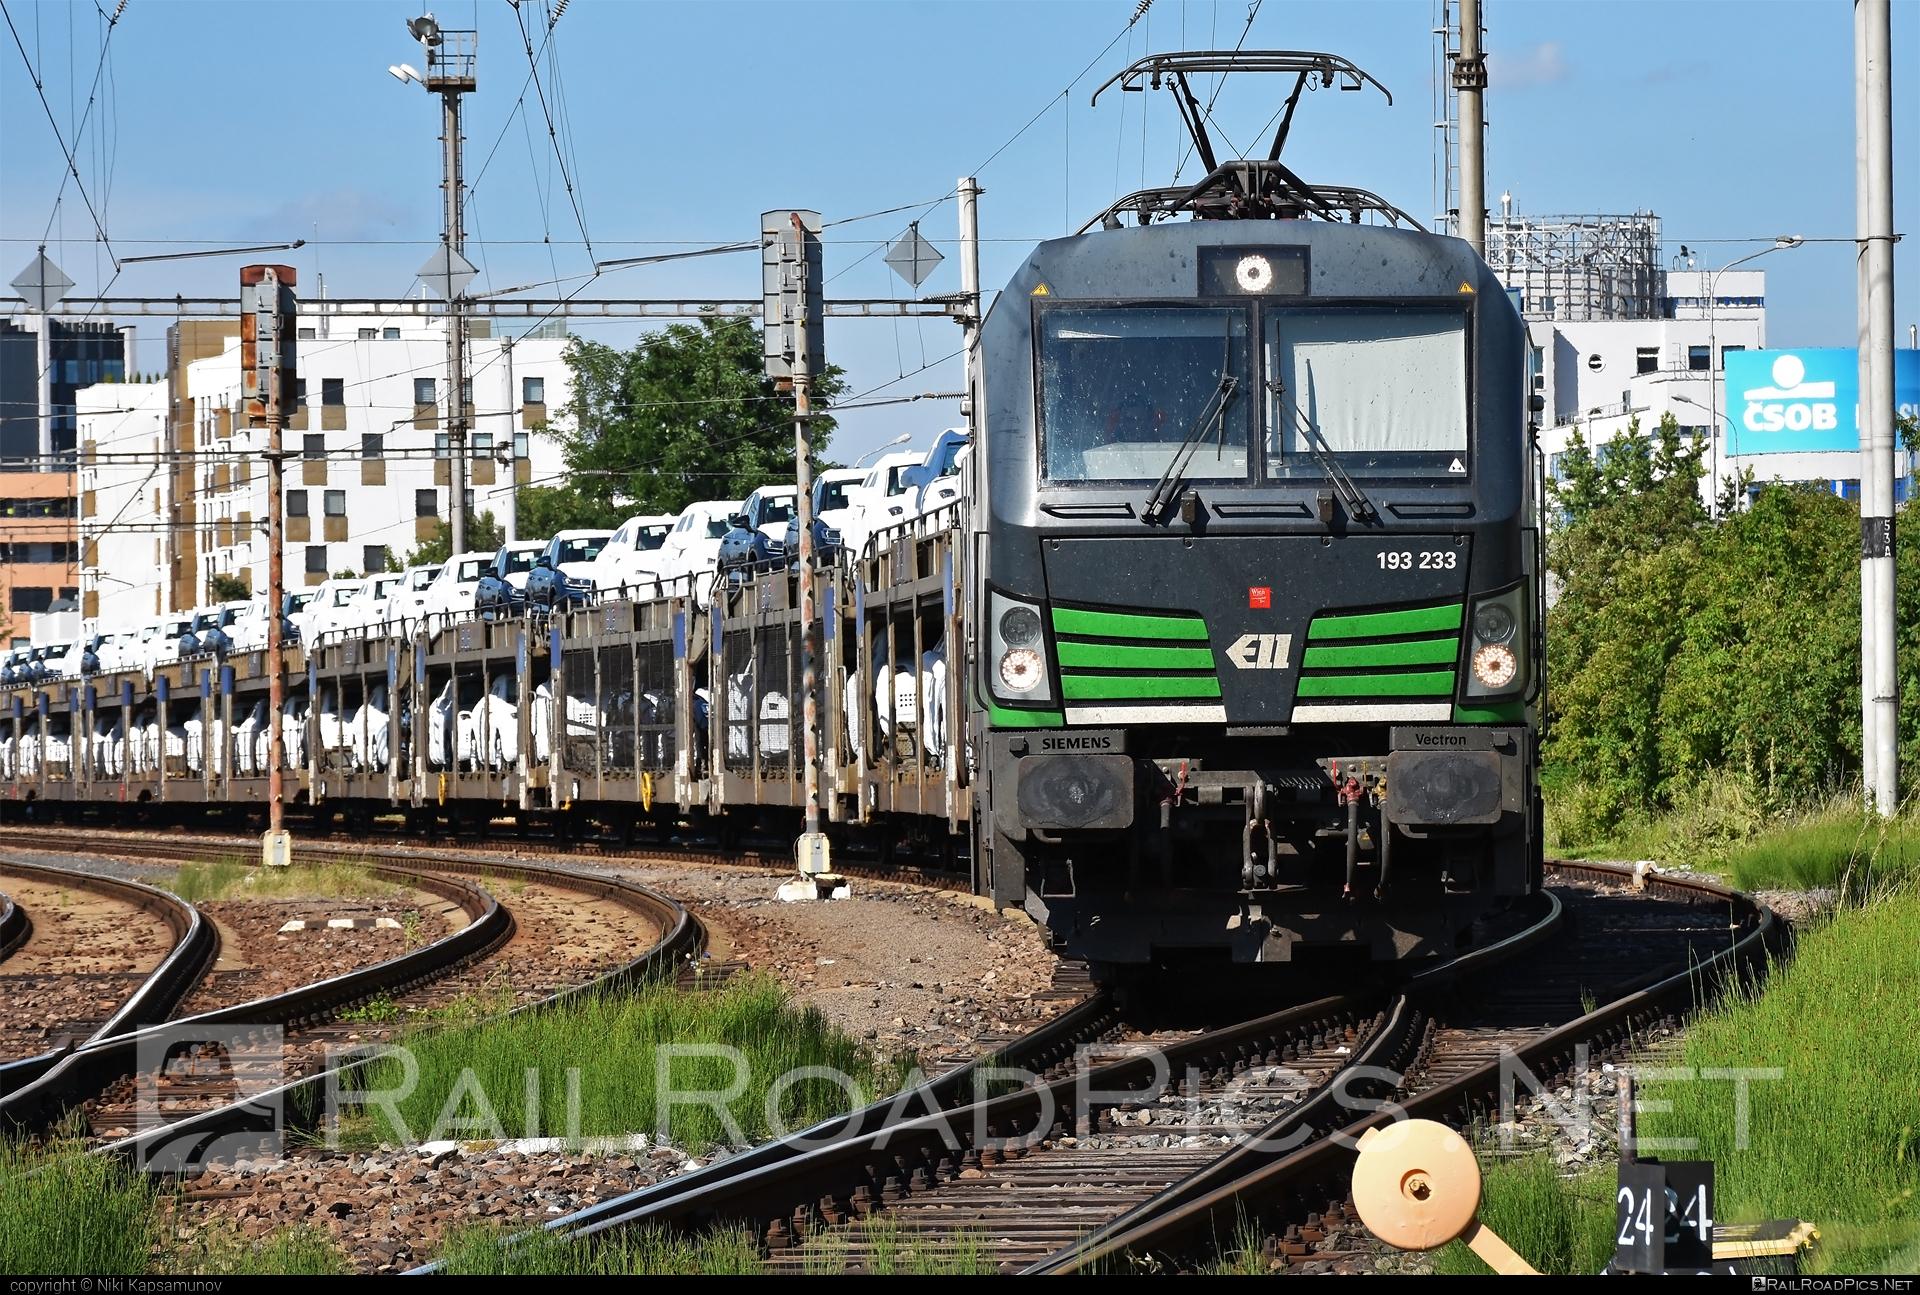 Siemens Vectron AC - 193 233 operated by ecco-rail GmbH #blg #carcarrierwagon #eccorail #eccorailgmbh #ell #ellgermany #eloc #europeanlocomotiveleasing #siemens #siemensvectron #siemensvectronac #vectron #vectronac